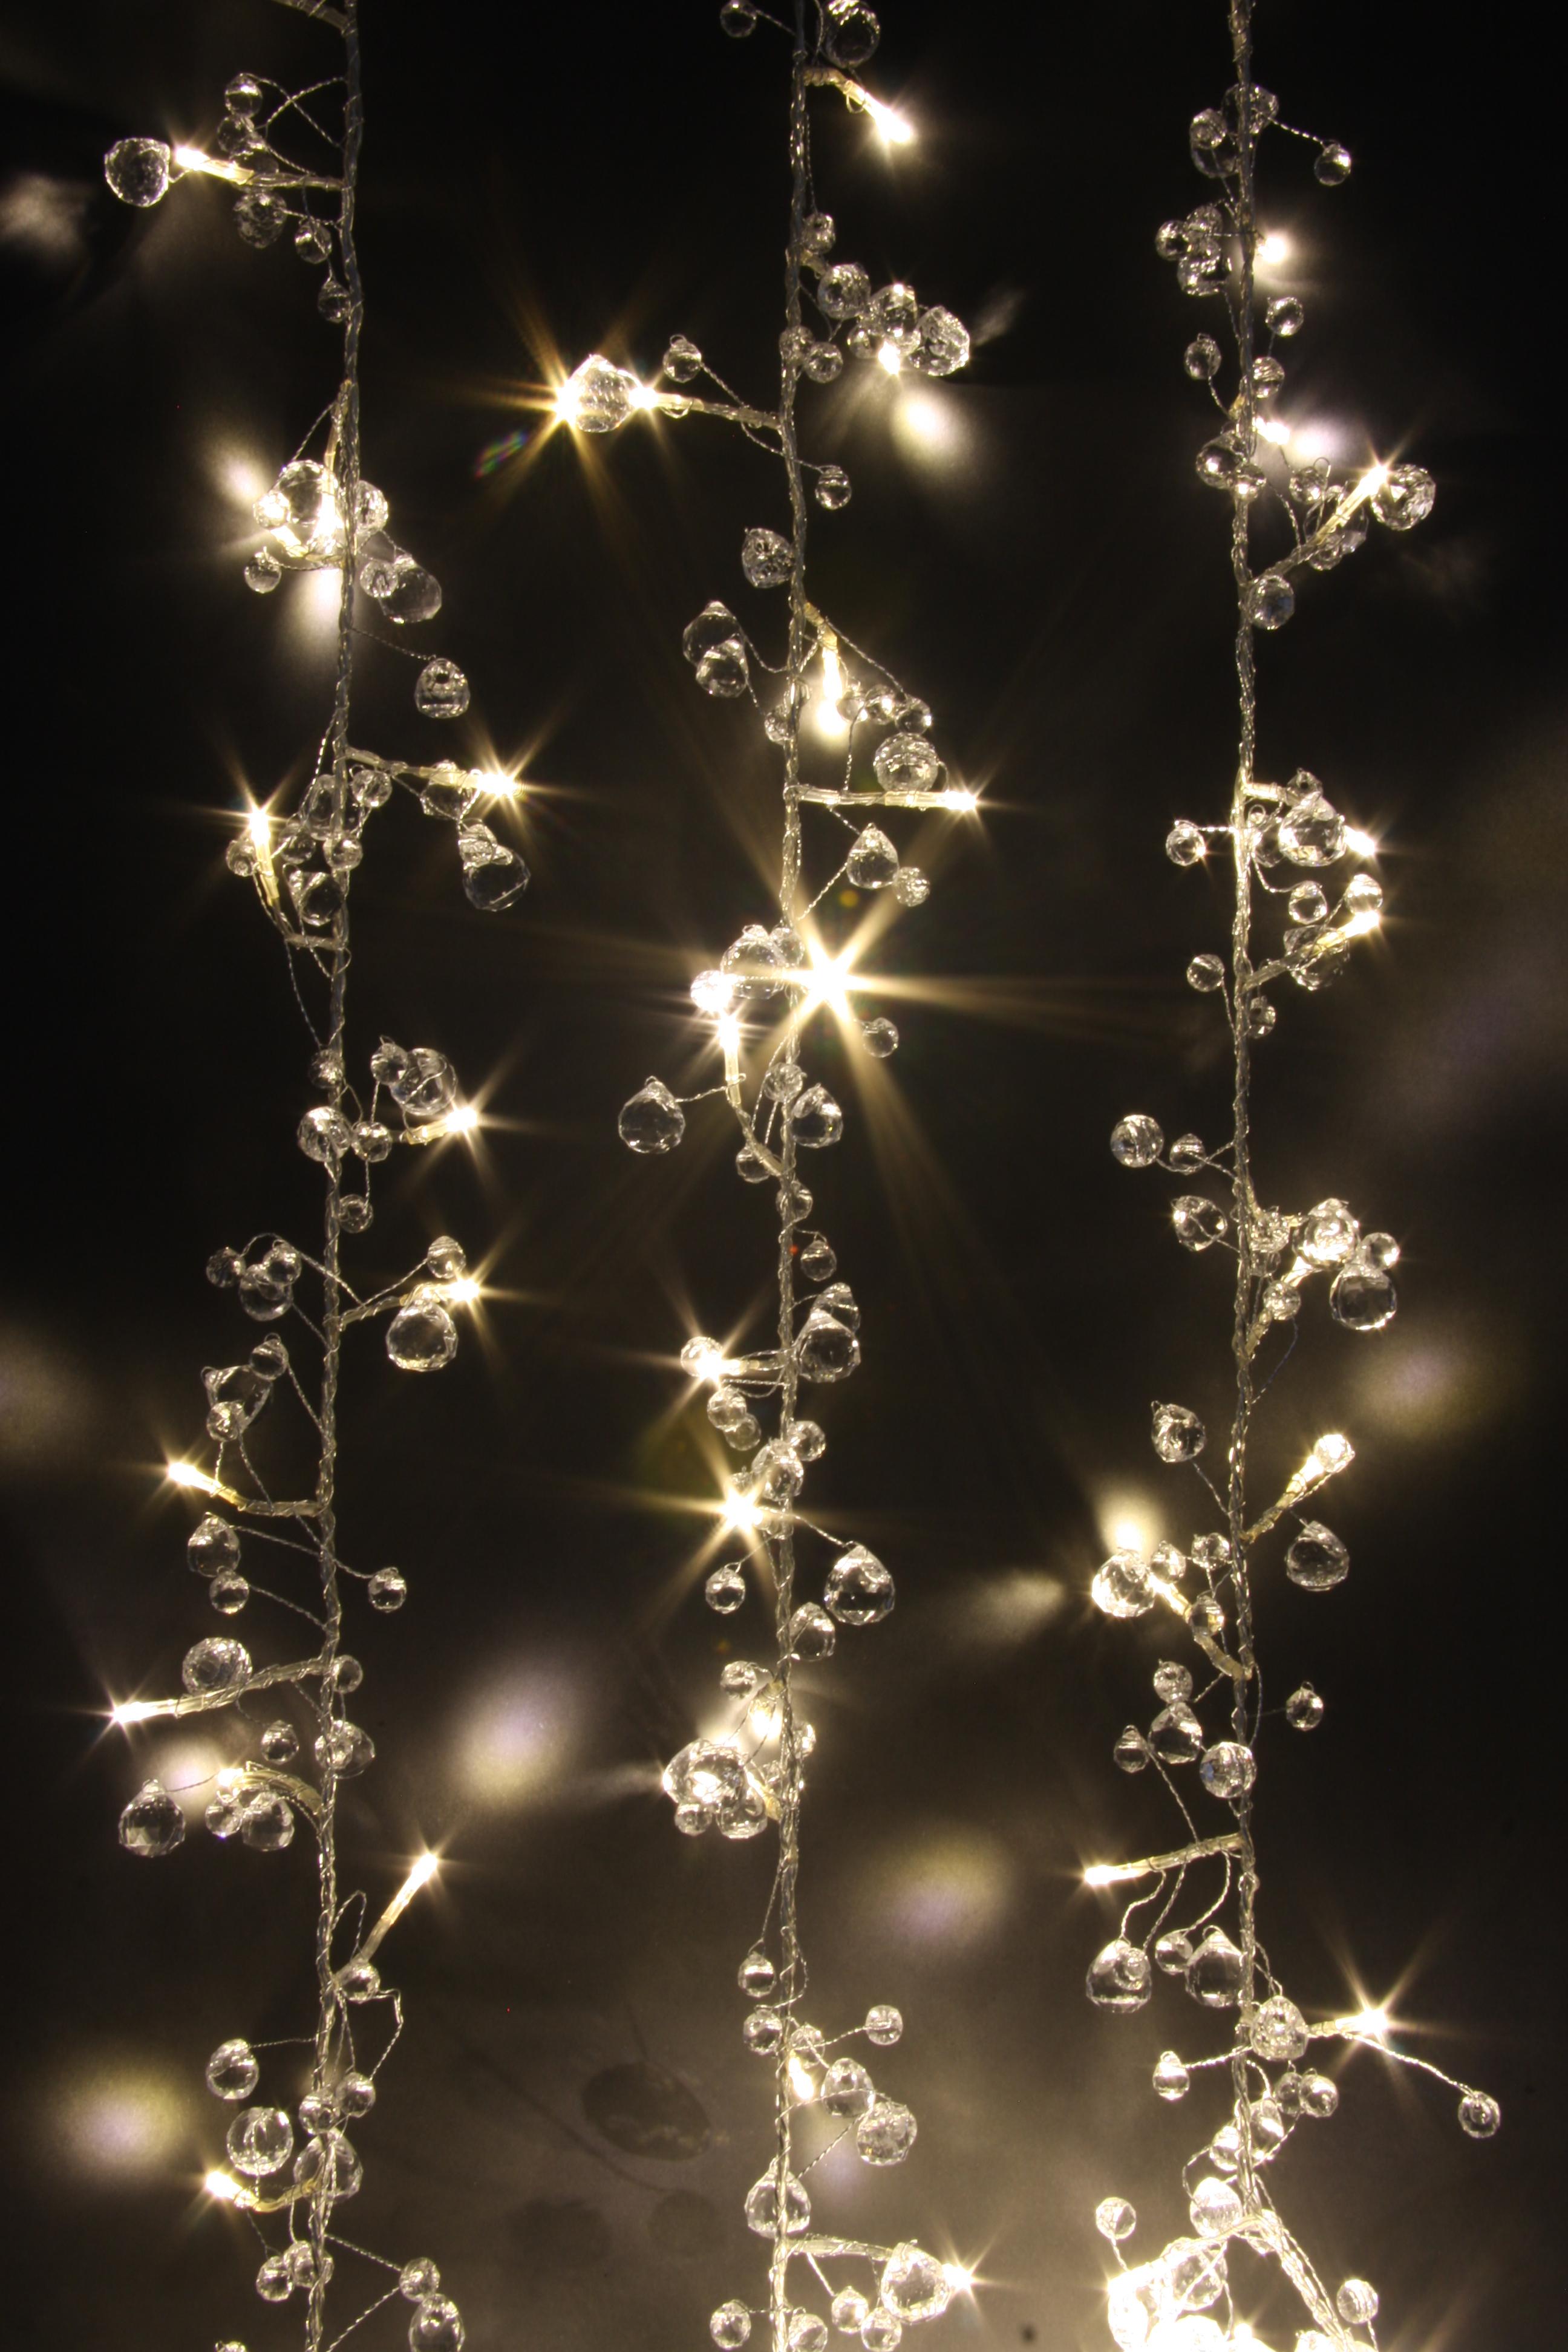 String Lights Mains : Fairy Lights - Crystal Chic - 50 LED String Lights - Mains Powered-ThinkGadgets eBay